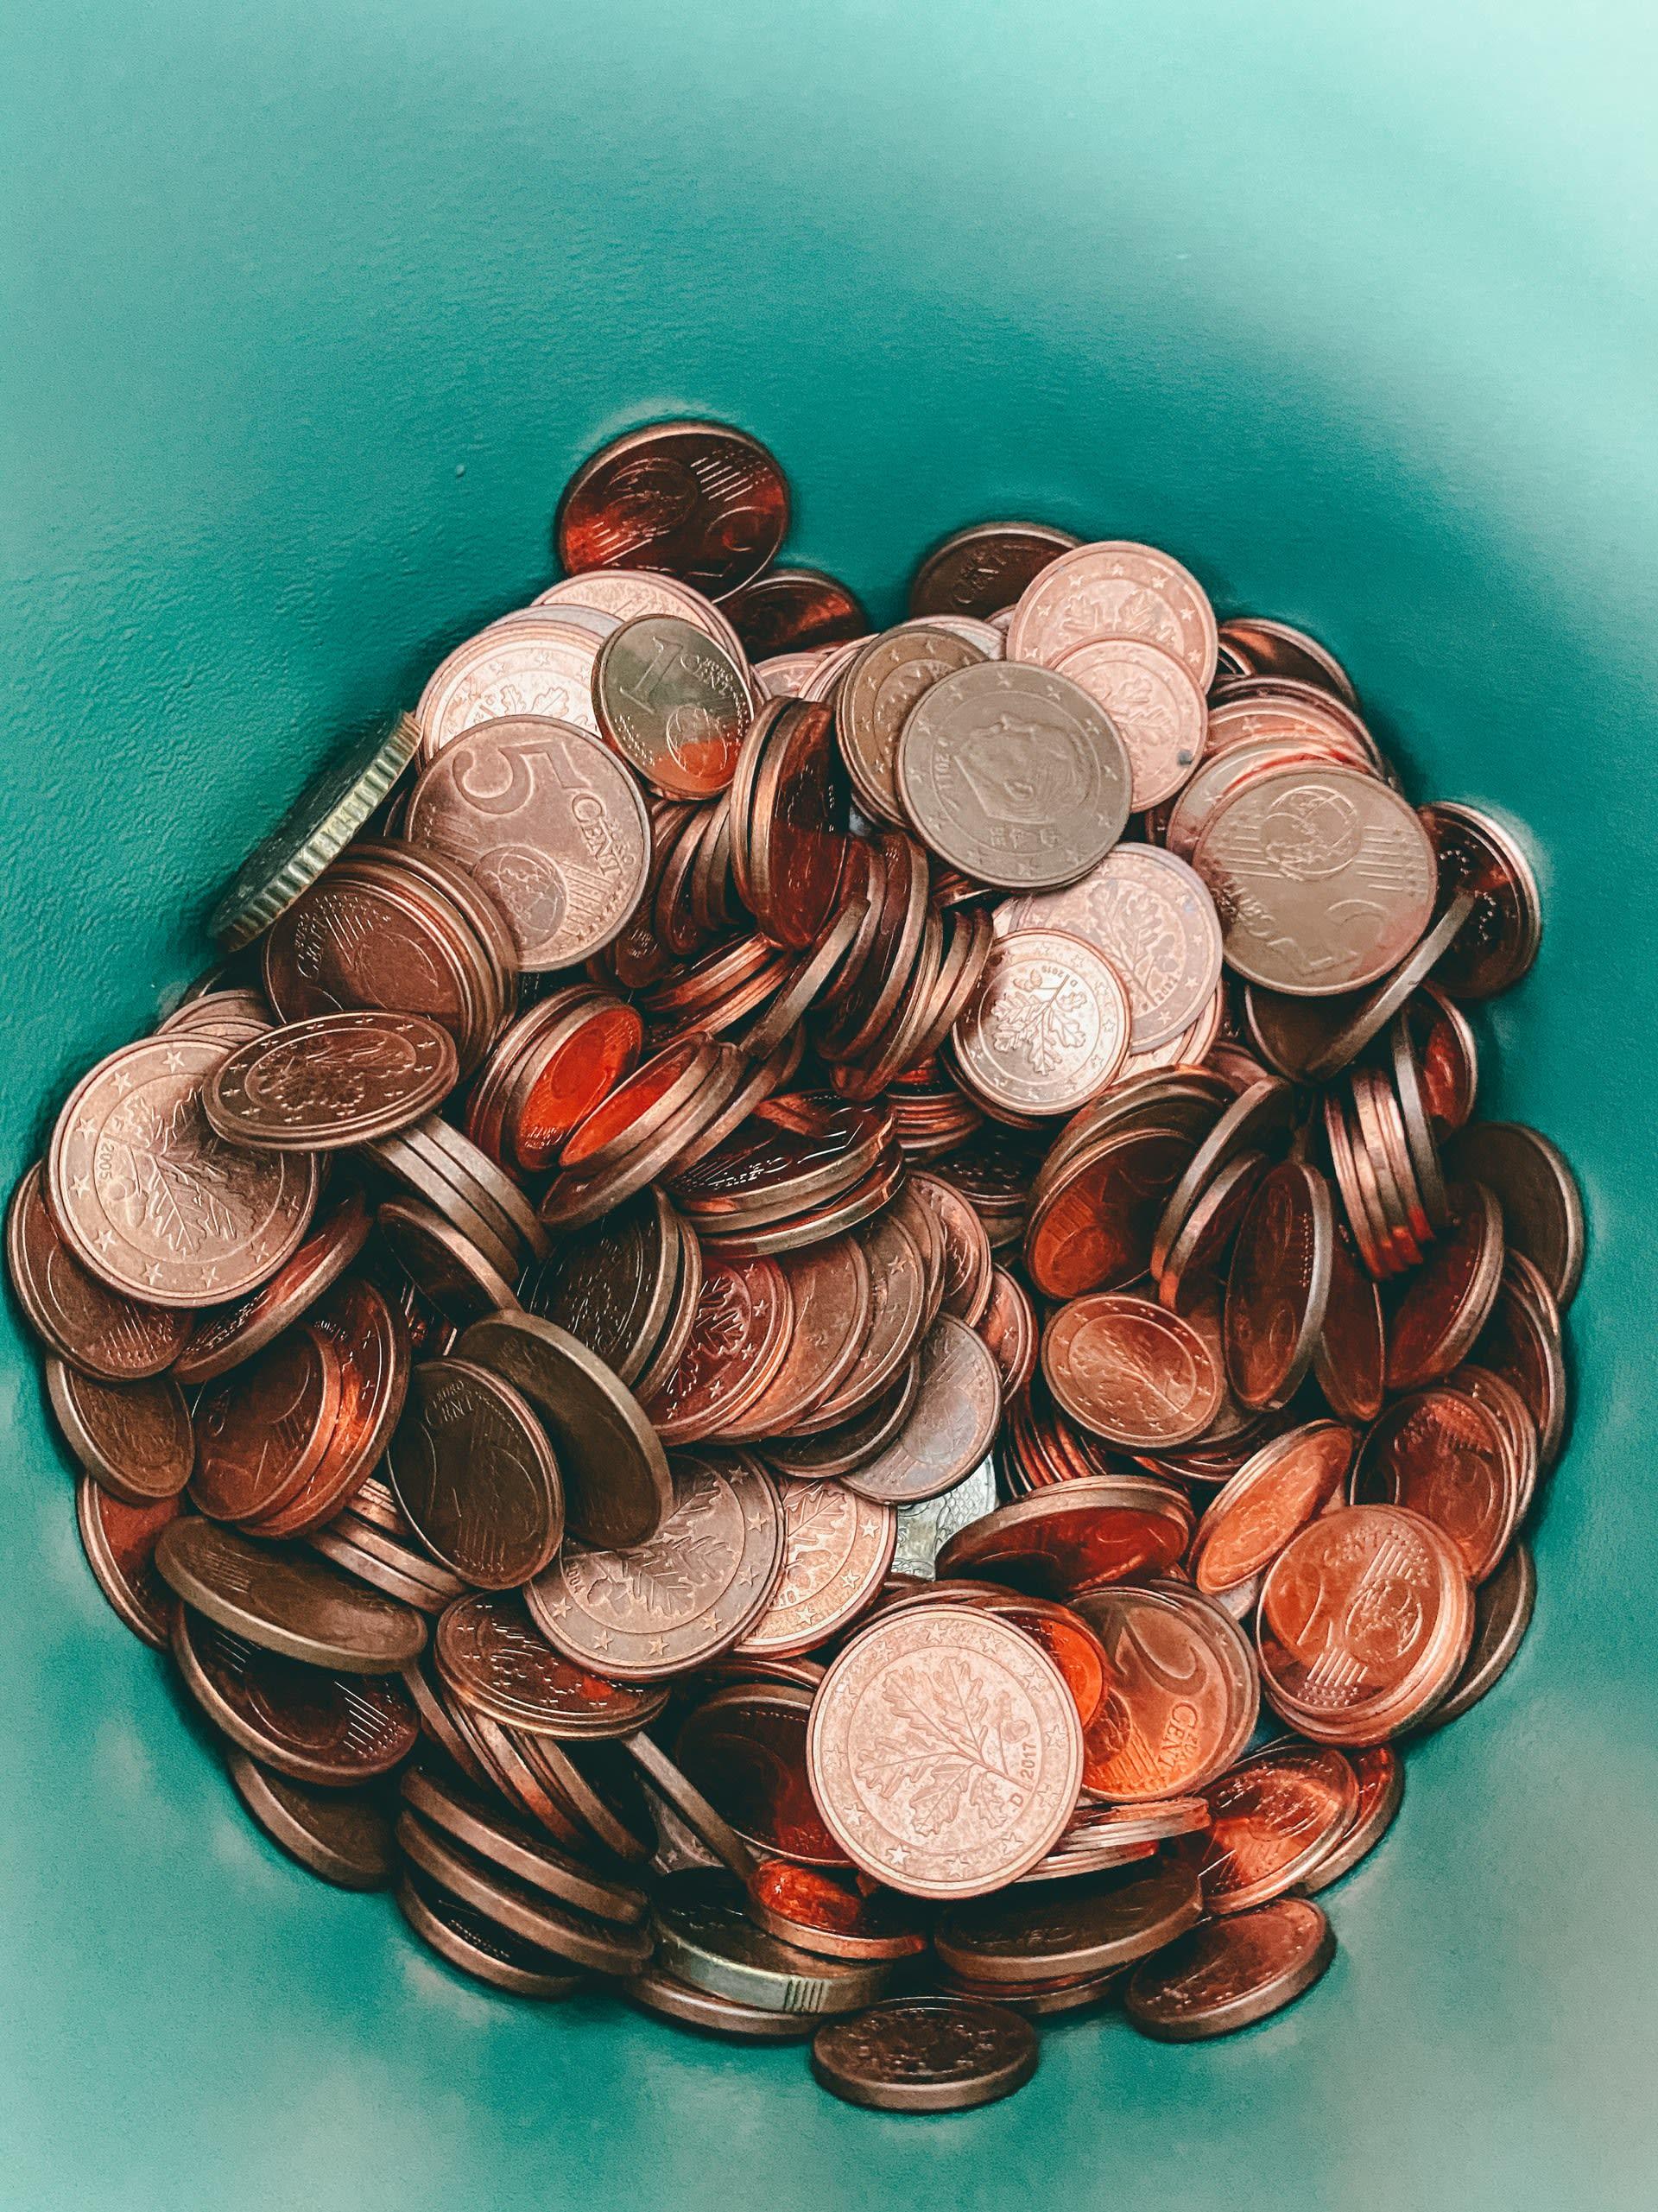 Free No Deposit Mobile Casino Bonus Rules